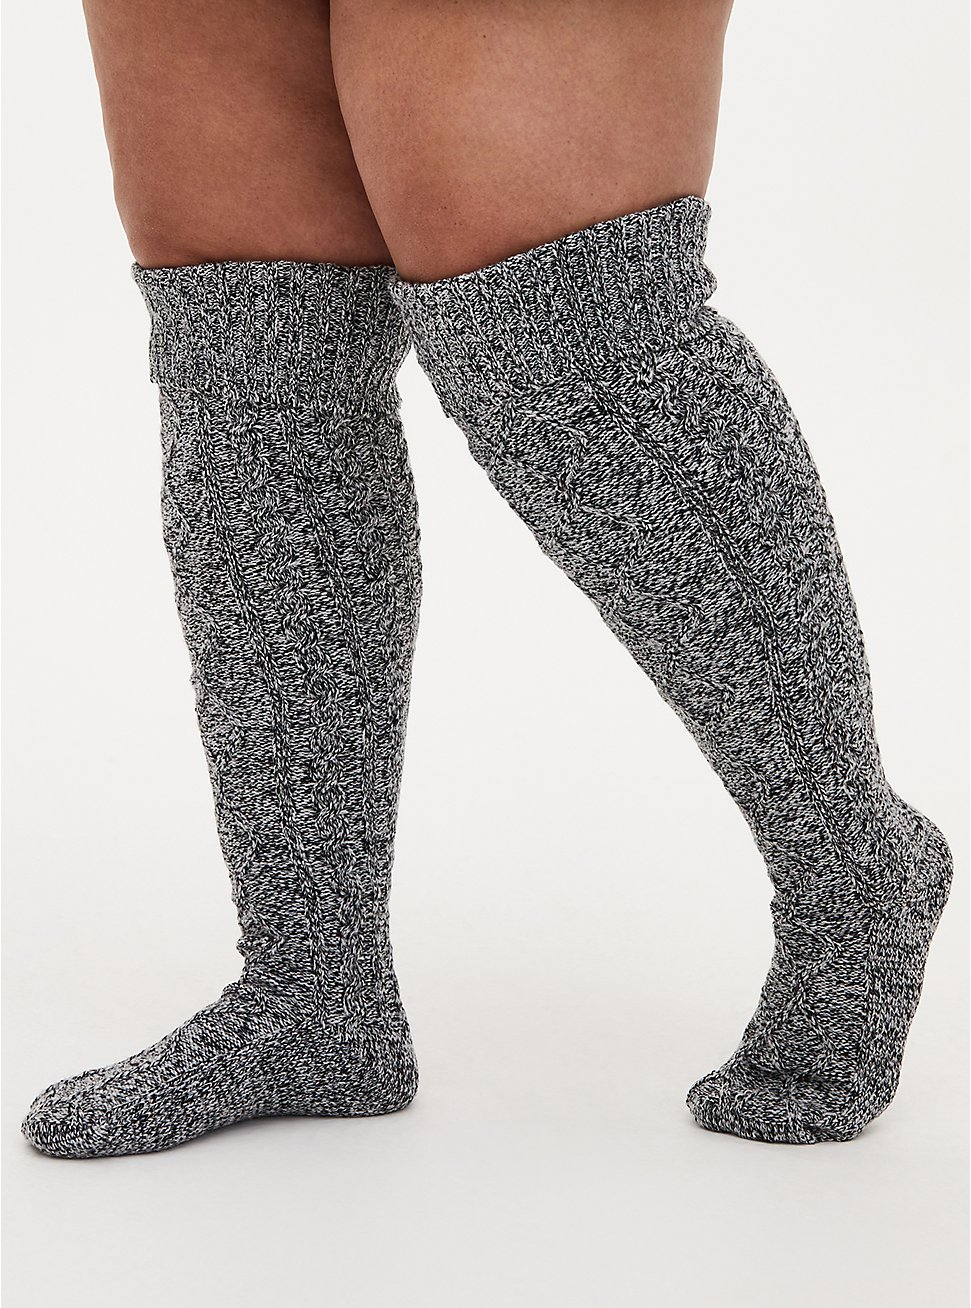 Grey Marled Knee High Socks, GREY, hi-res